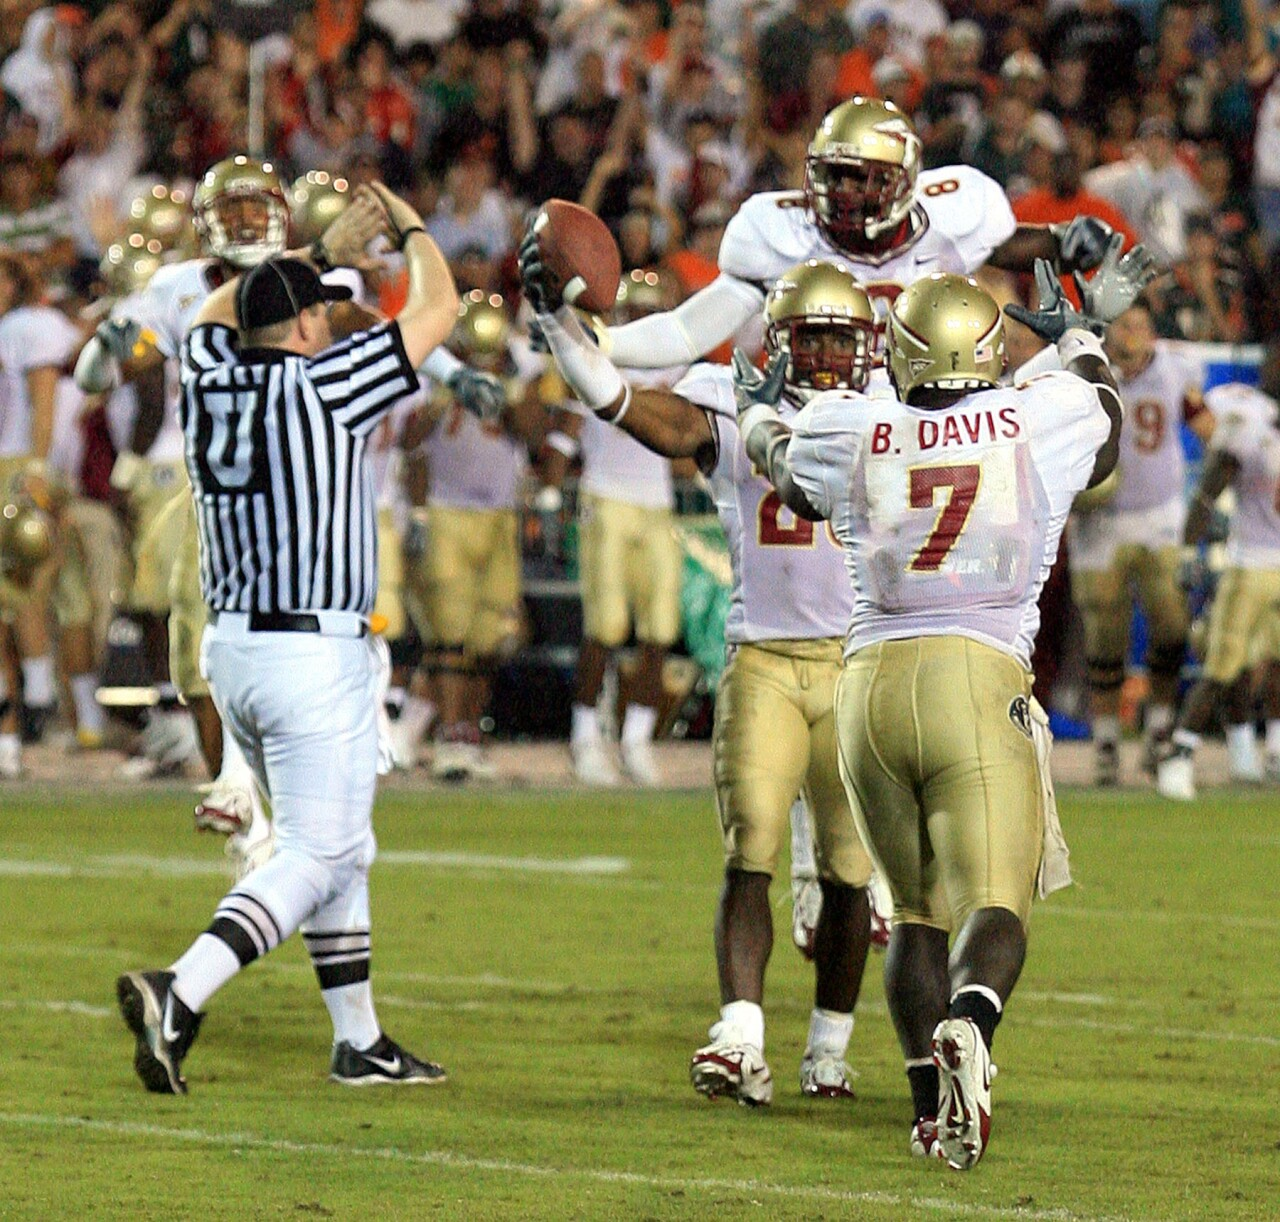 Florida State Seminoles cornerback Michael Ray Garvin celebrates interceptions against Miami Hurricanes in 2006